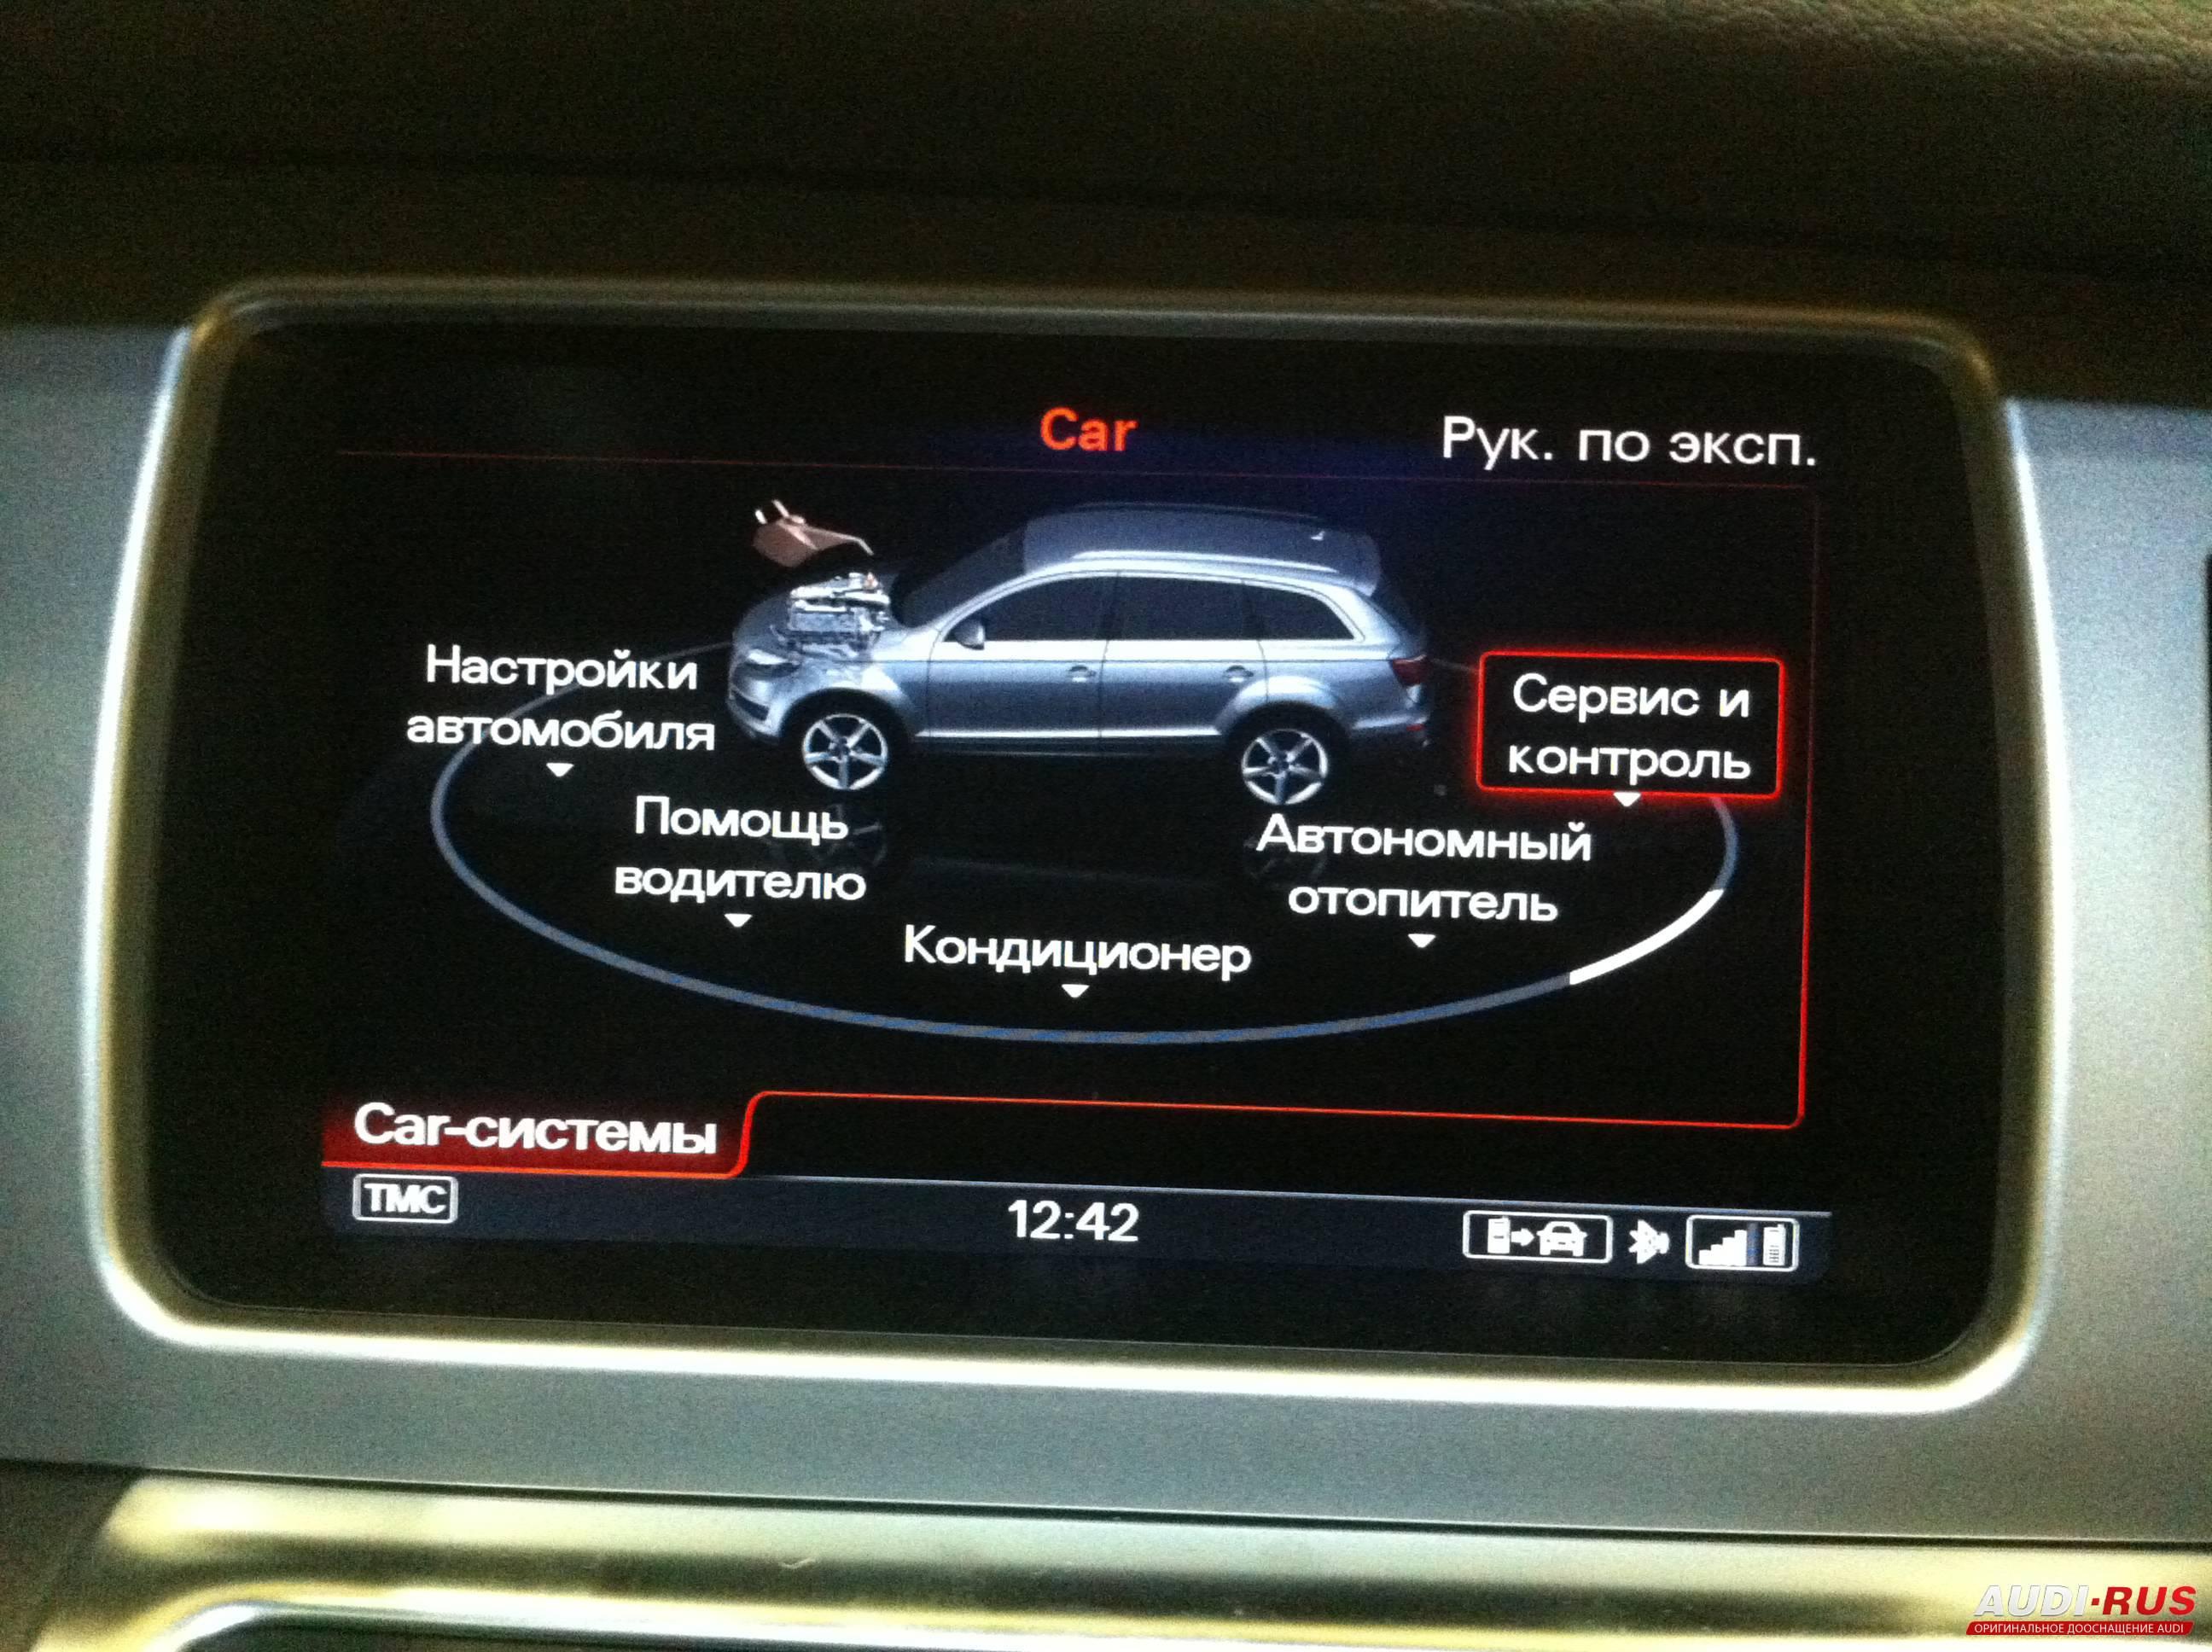 Навигационная система MMI 3G Plus для Audi Q7 - Audi RUS